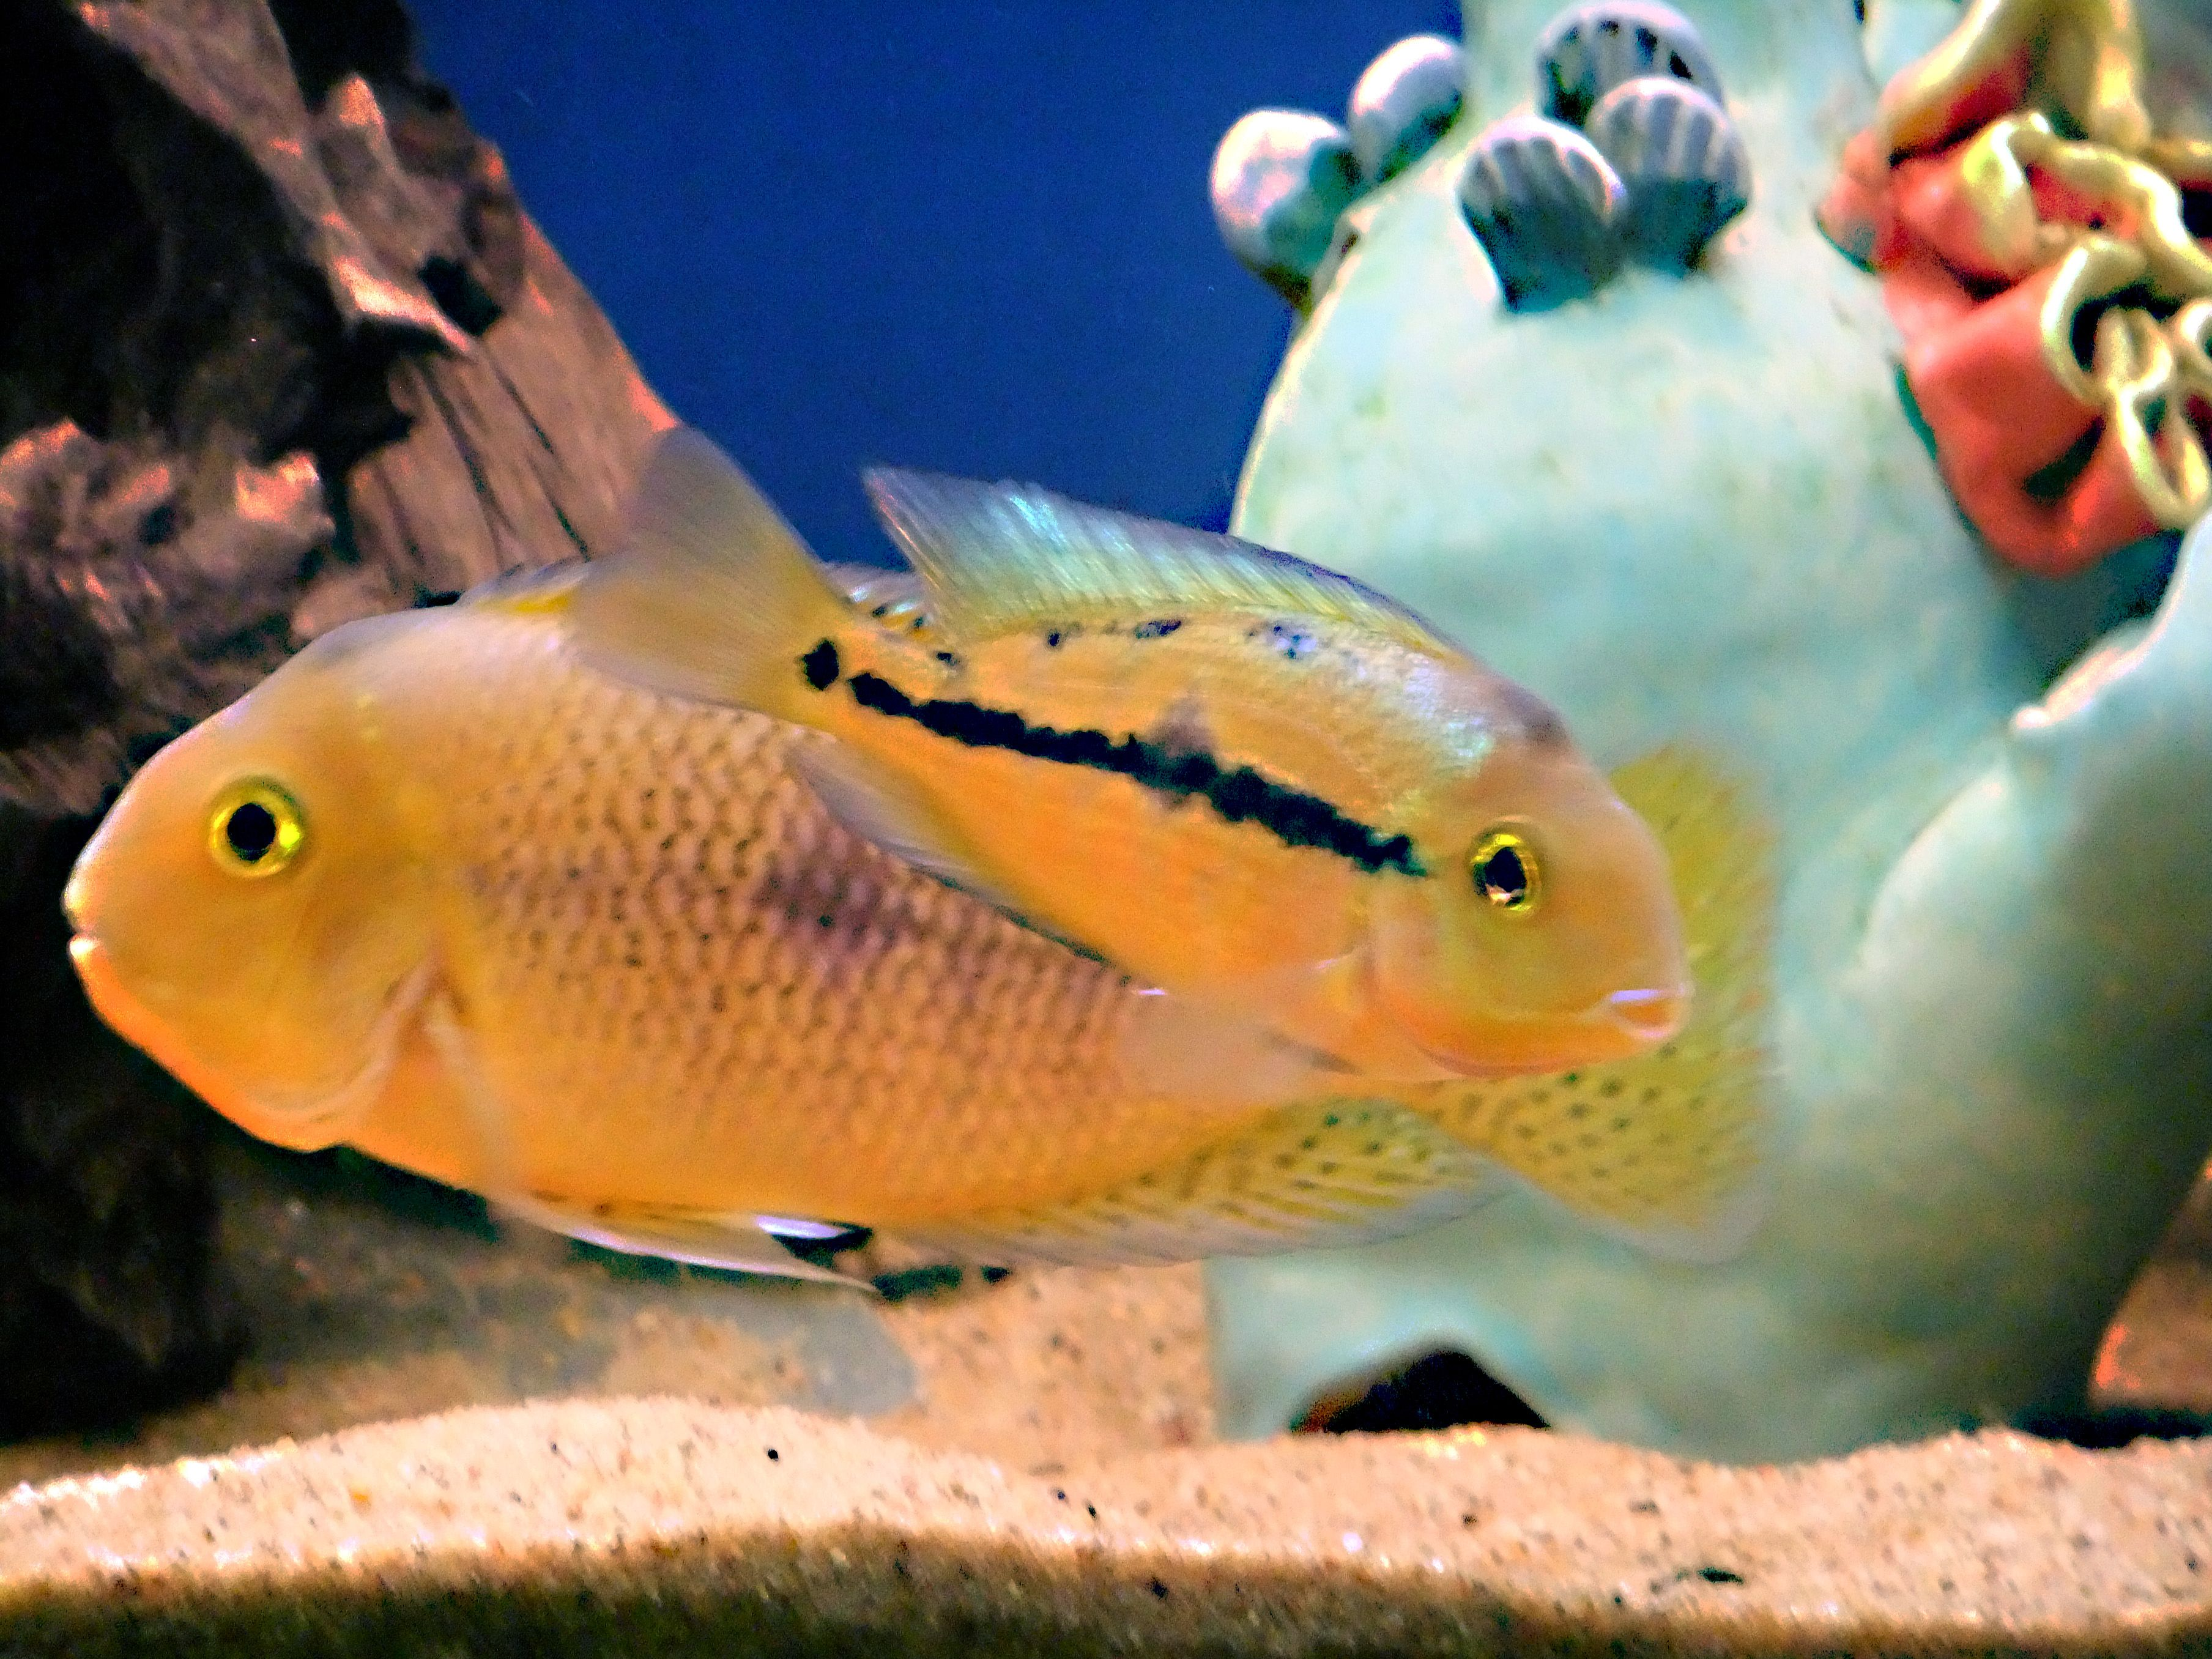 Freshwater aquarium fish breeding - Breeding Pair Of Nicaraguan Cichlids Nicaraguanaquarium Freshwateraquarium Fishbreeding